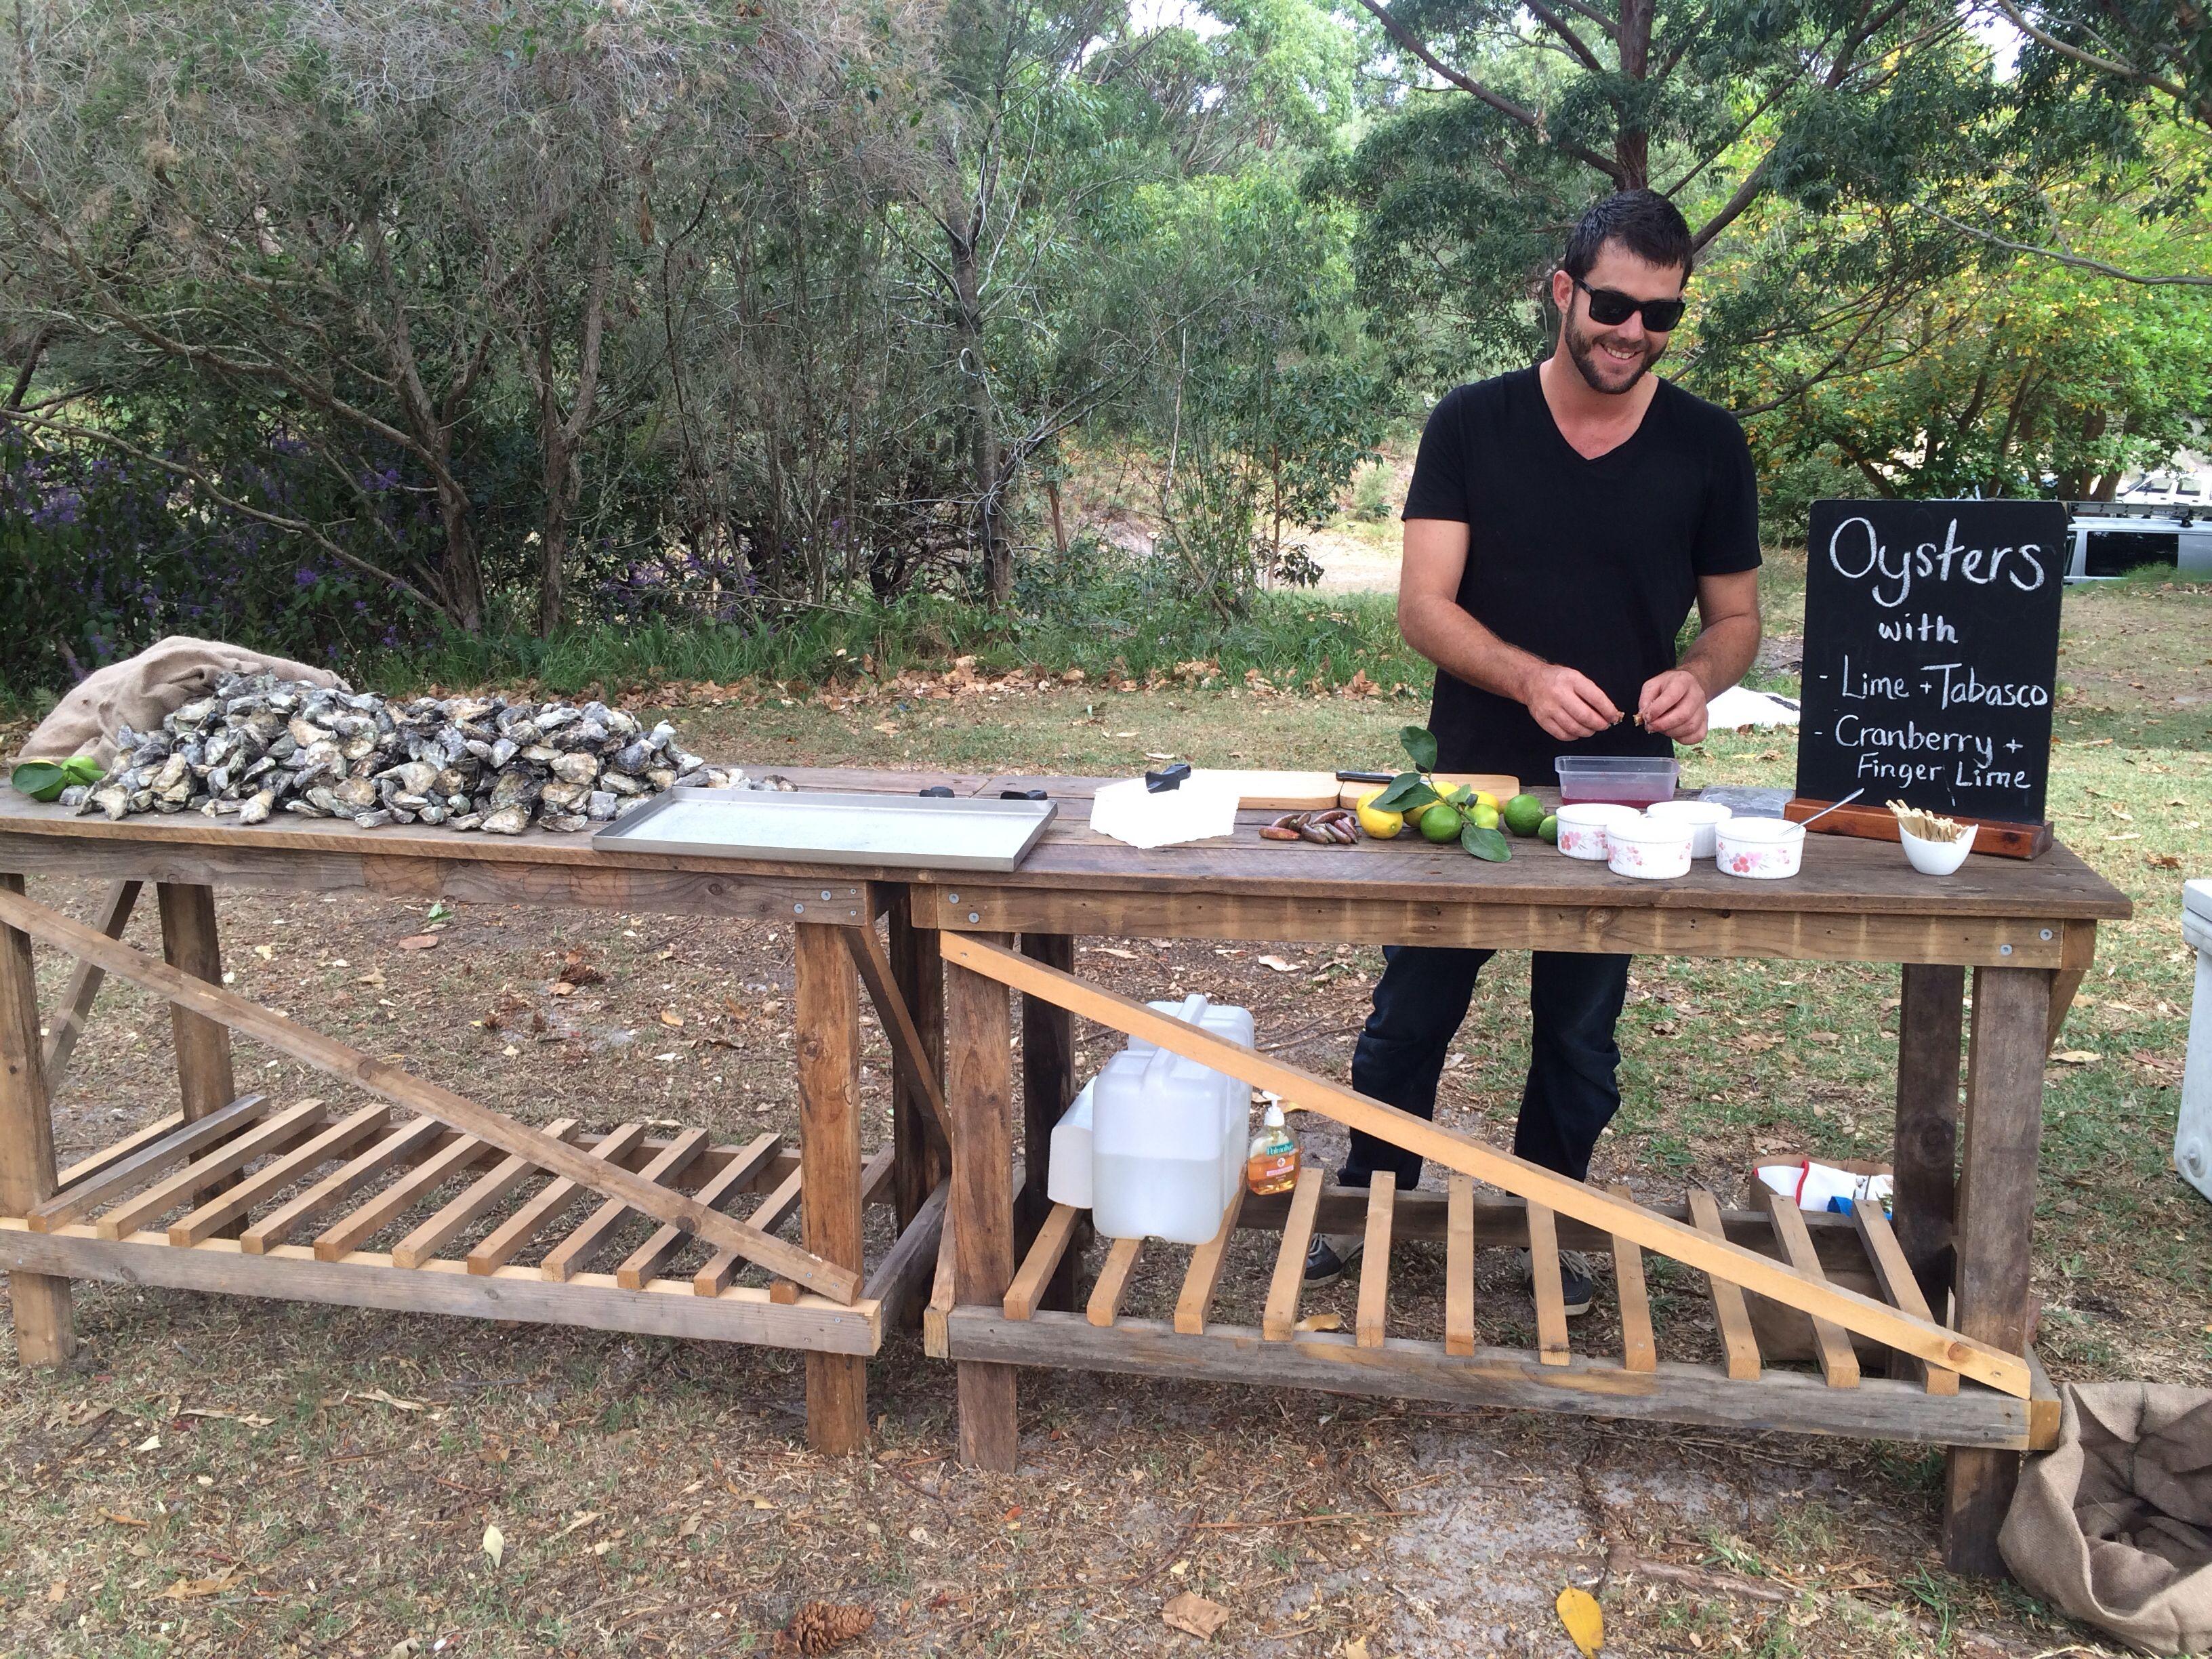 Oyster Farmer, Ewan McAsh, setting up 'The Oyster Bar' at a local south coast wedding.